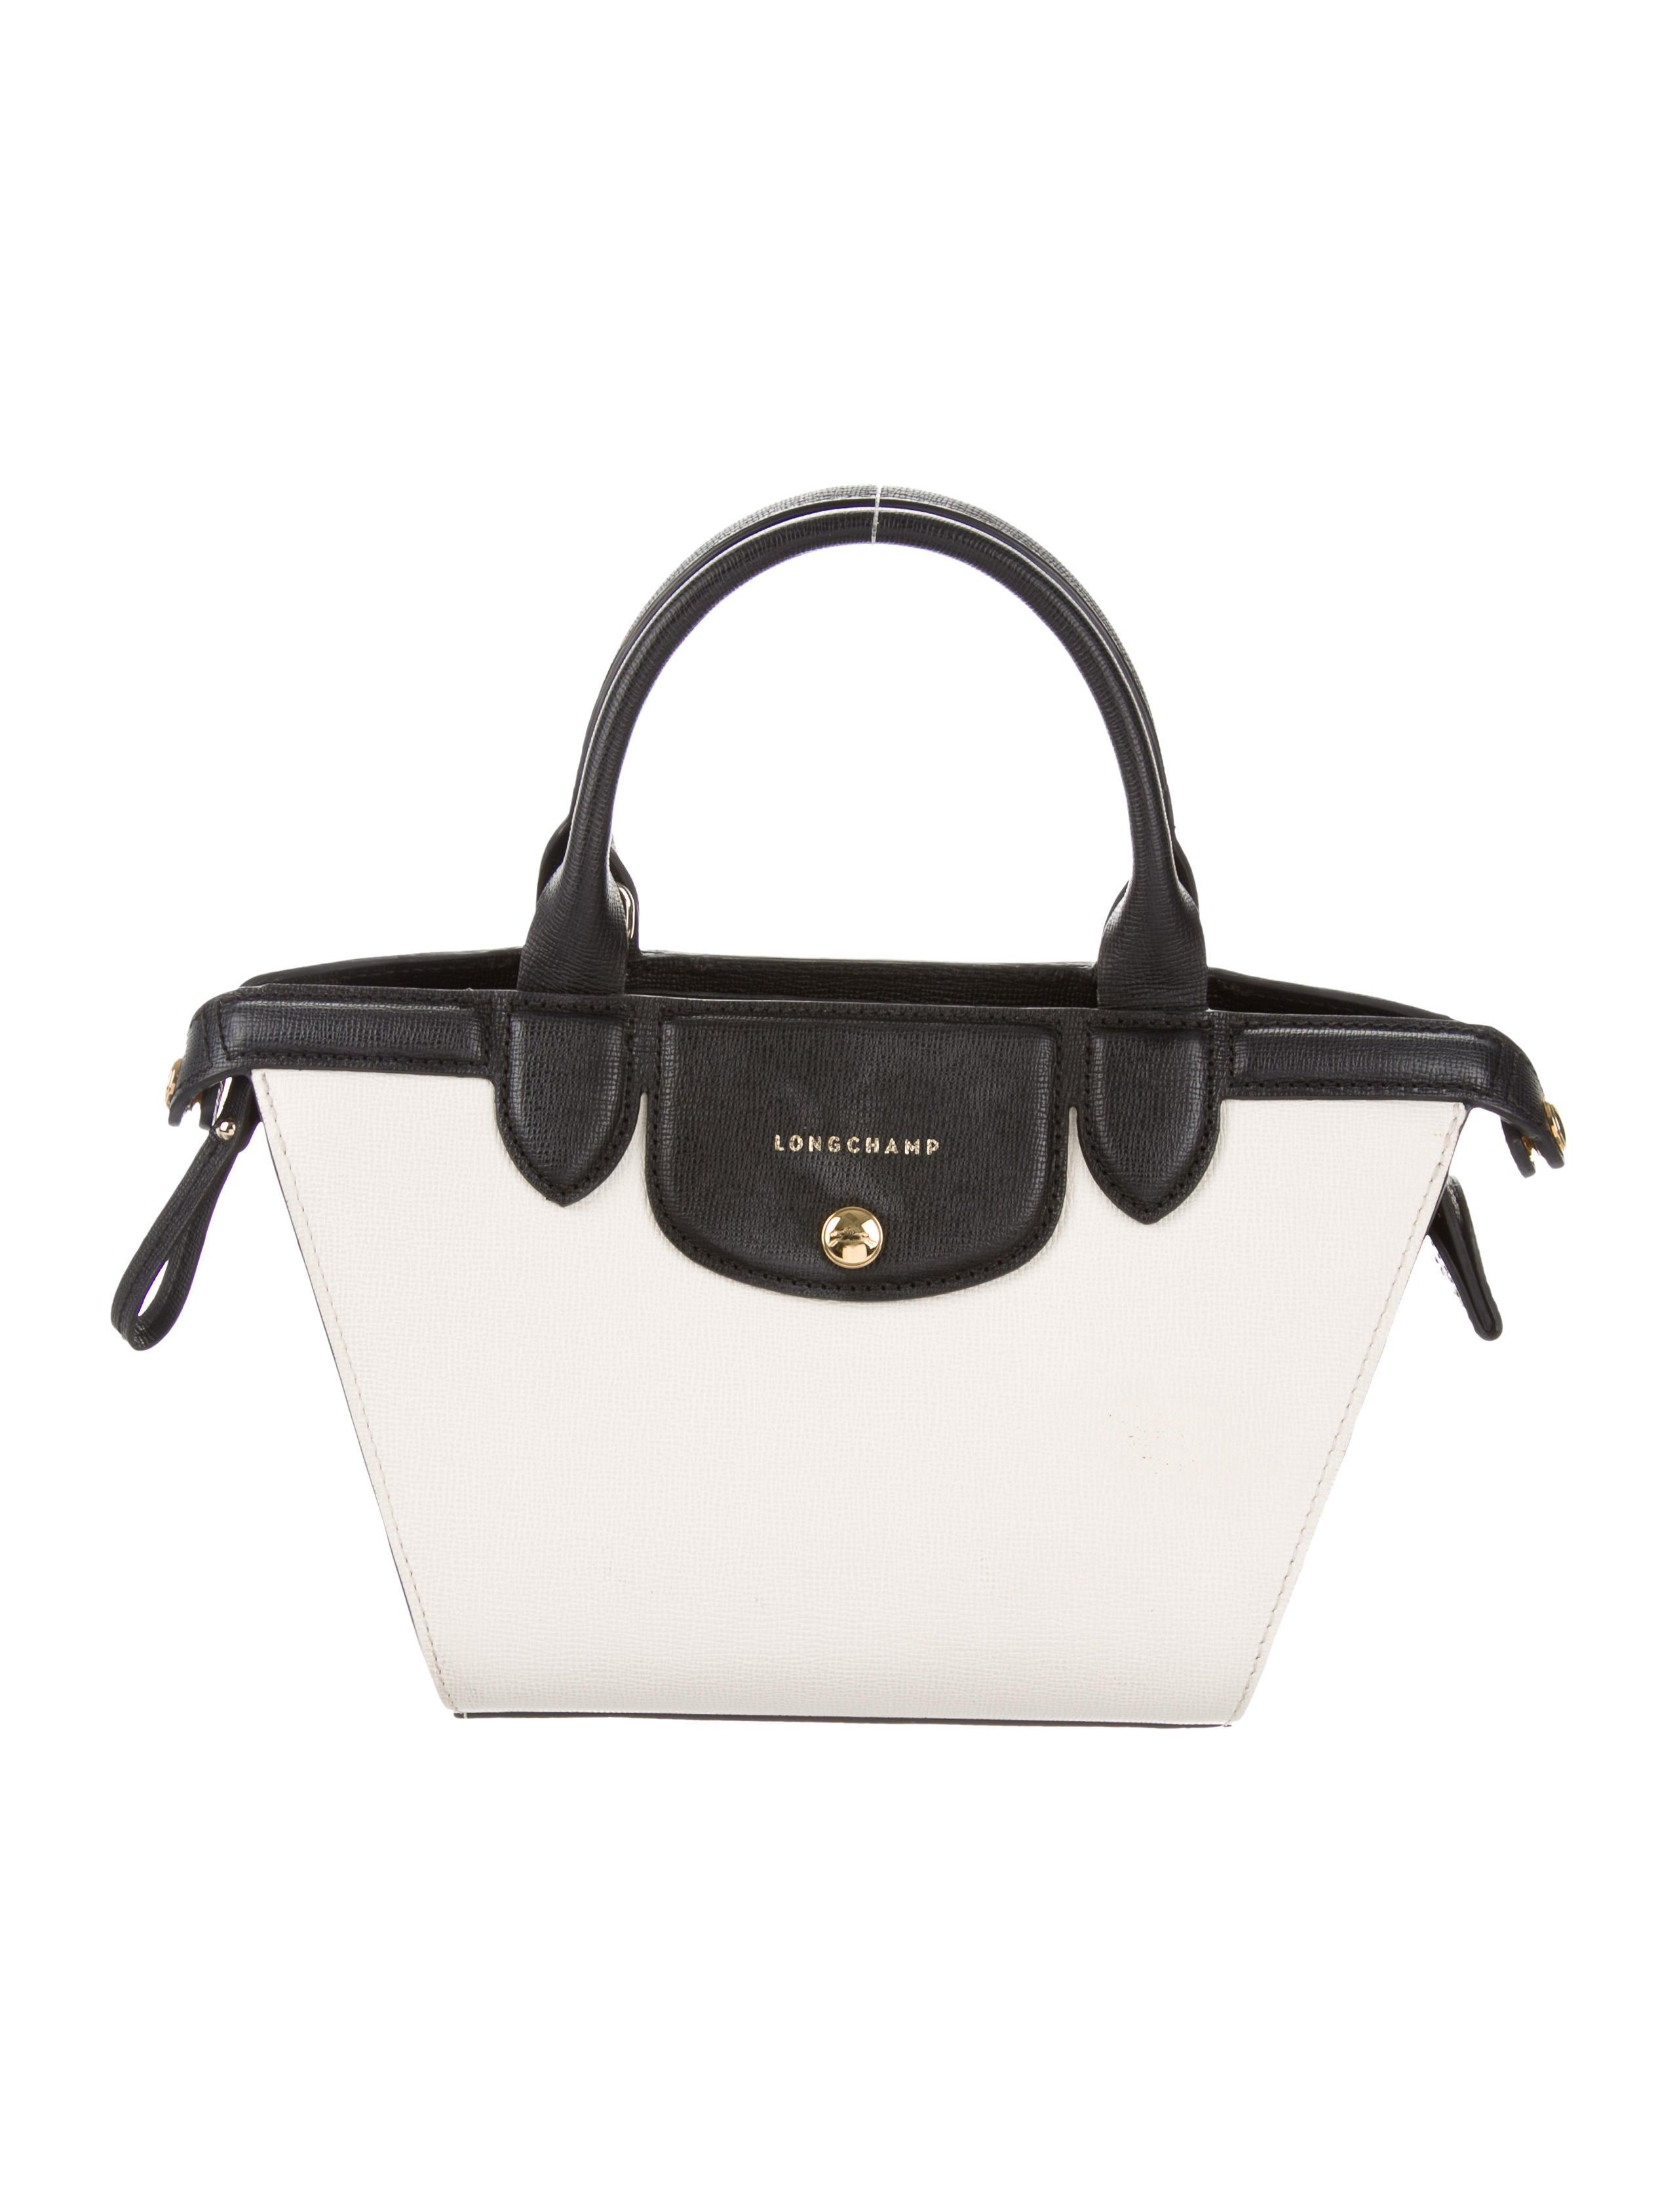 95f053731e5c Longchamp Small Le Pliage Heritage Satchel - Handbags - WL822214 ...